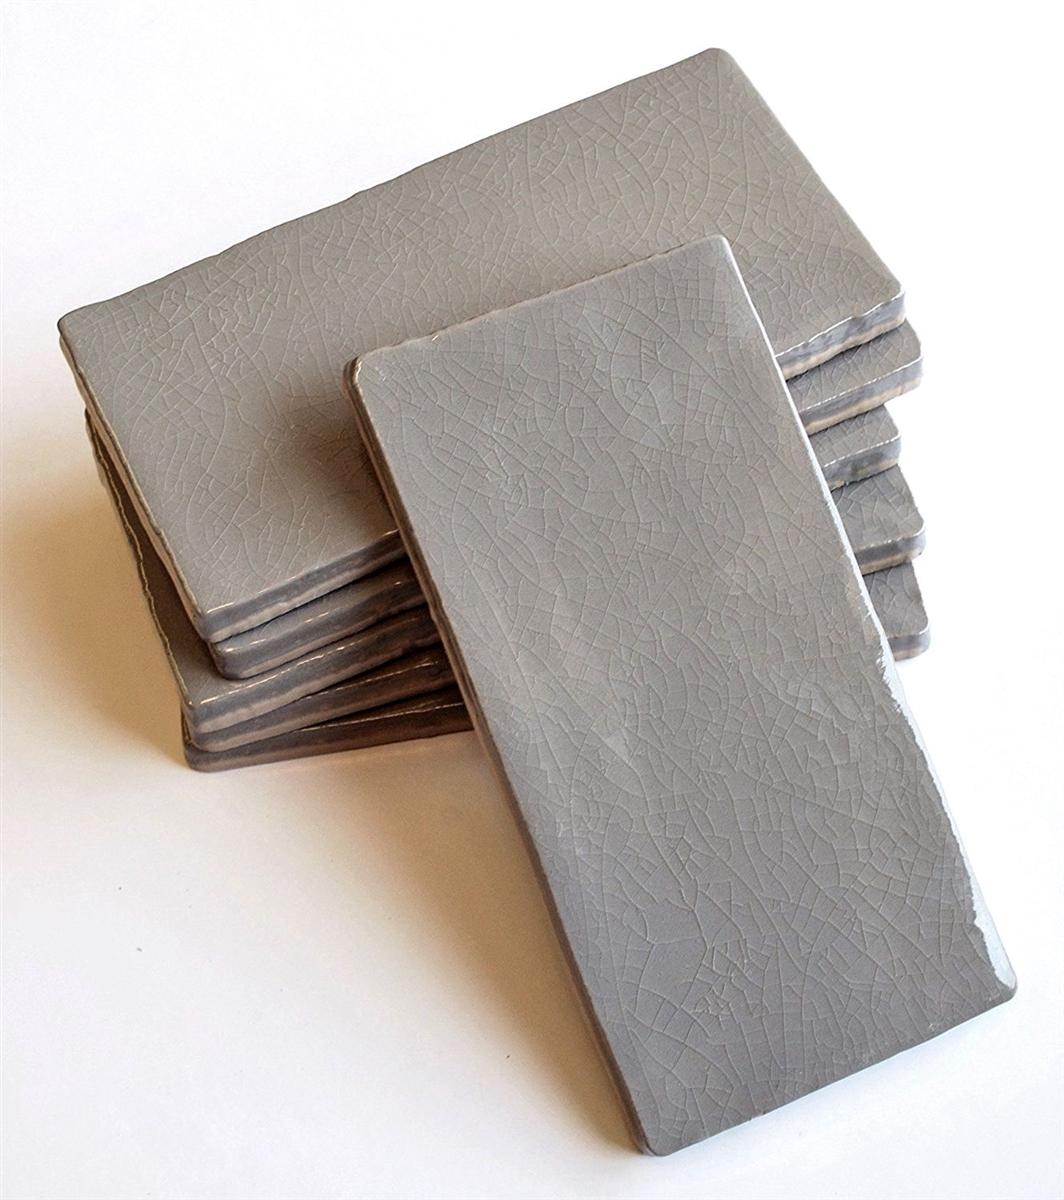 3x6 gray crackle glaze subway ceramic wall tile